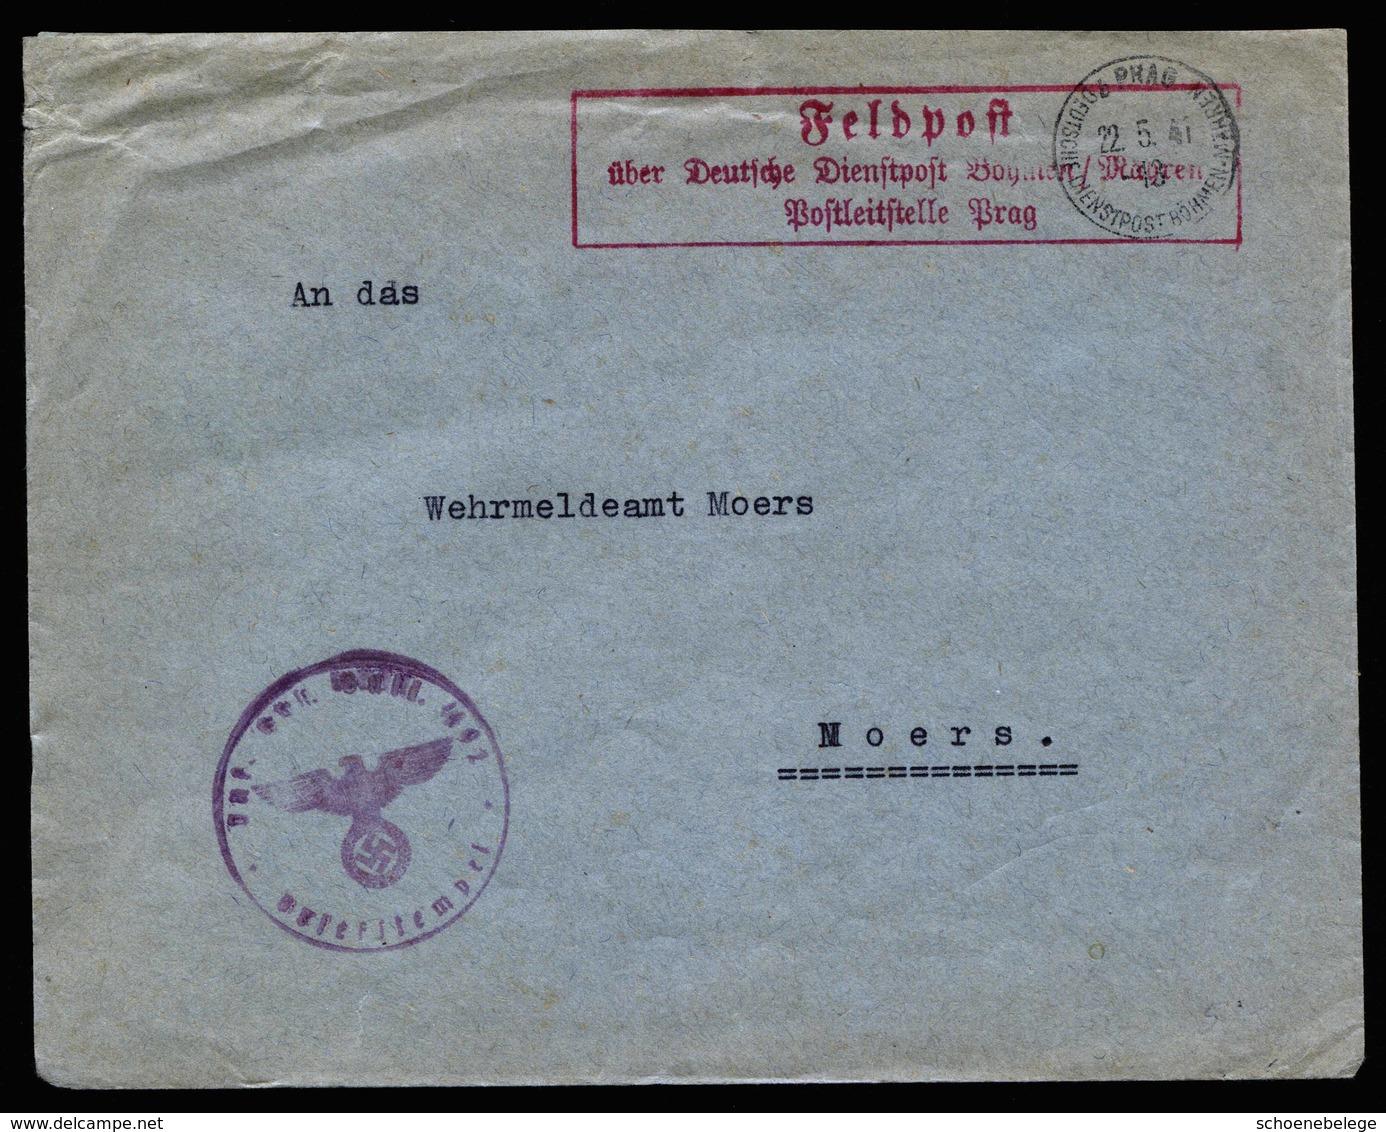 A5783) Böhmen & Mähren Feldpostbrief Prag 22.05.41 N. Moers - Briefe U. Dokumente